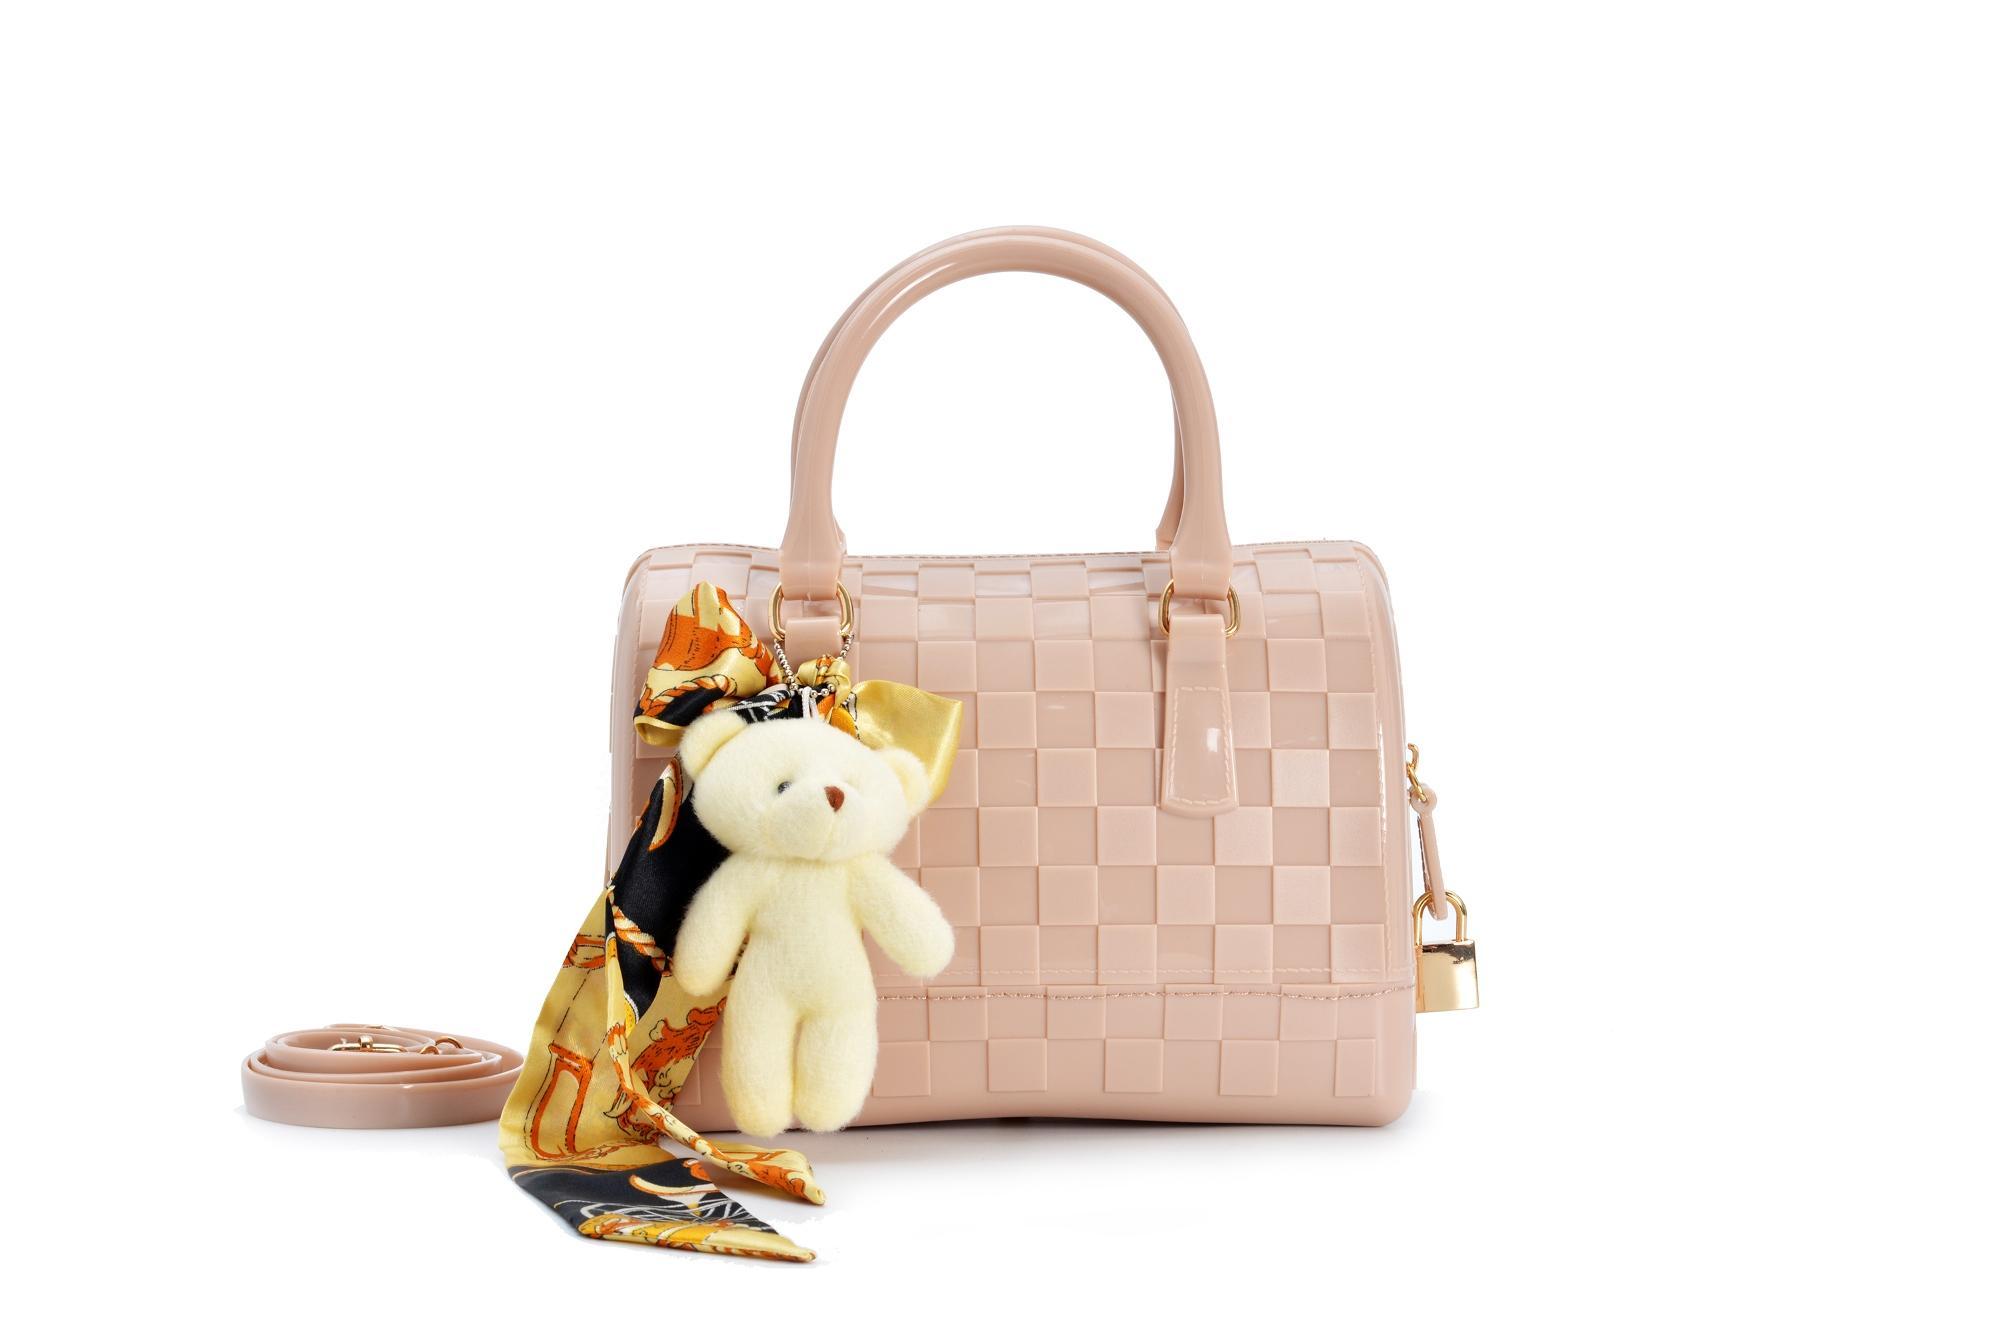 Tas Fashion Wanita Import, Tas Wanita, Tas Import Furla Jelly Tabung Speedy Mini FREE Accessoris Syal, Boneka dan Gembok